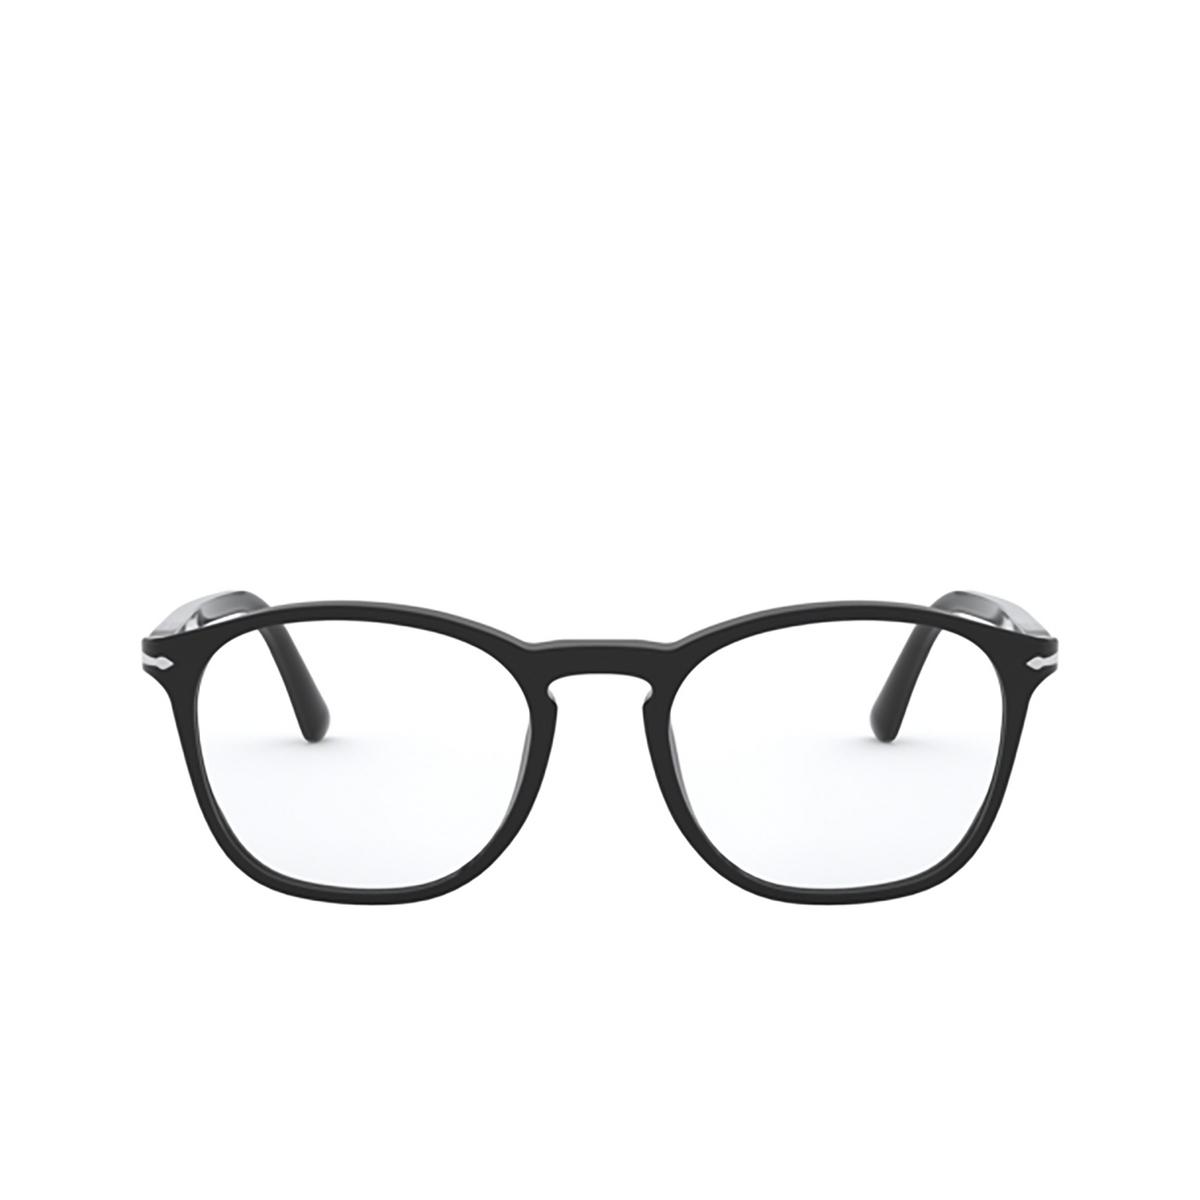 Persol® Square Eyeglasses: PO3007VM color Black 95 - front view.